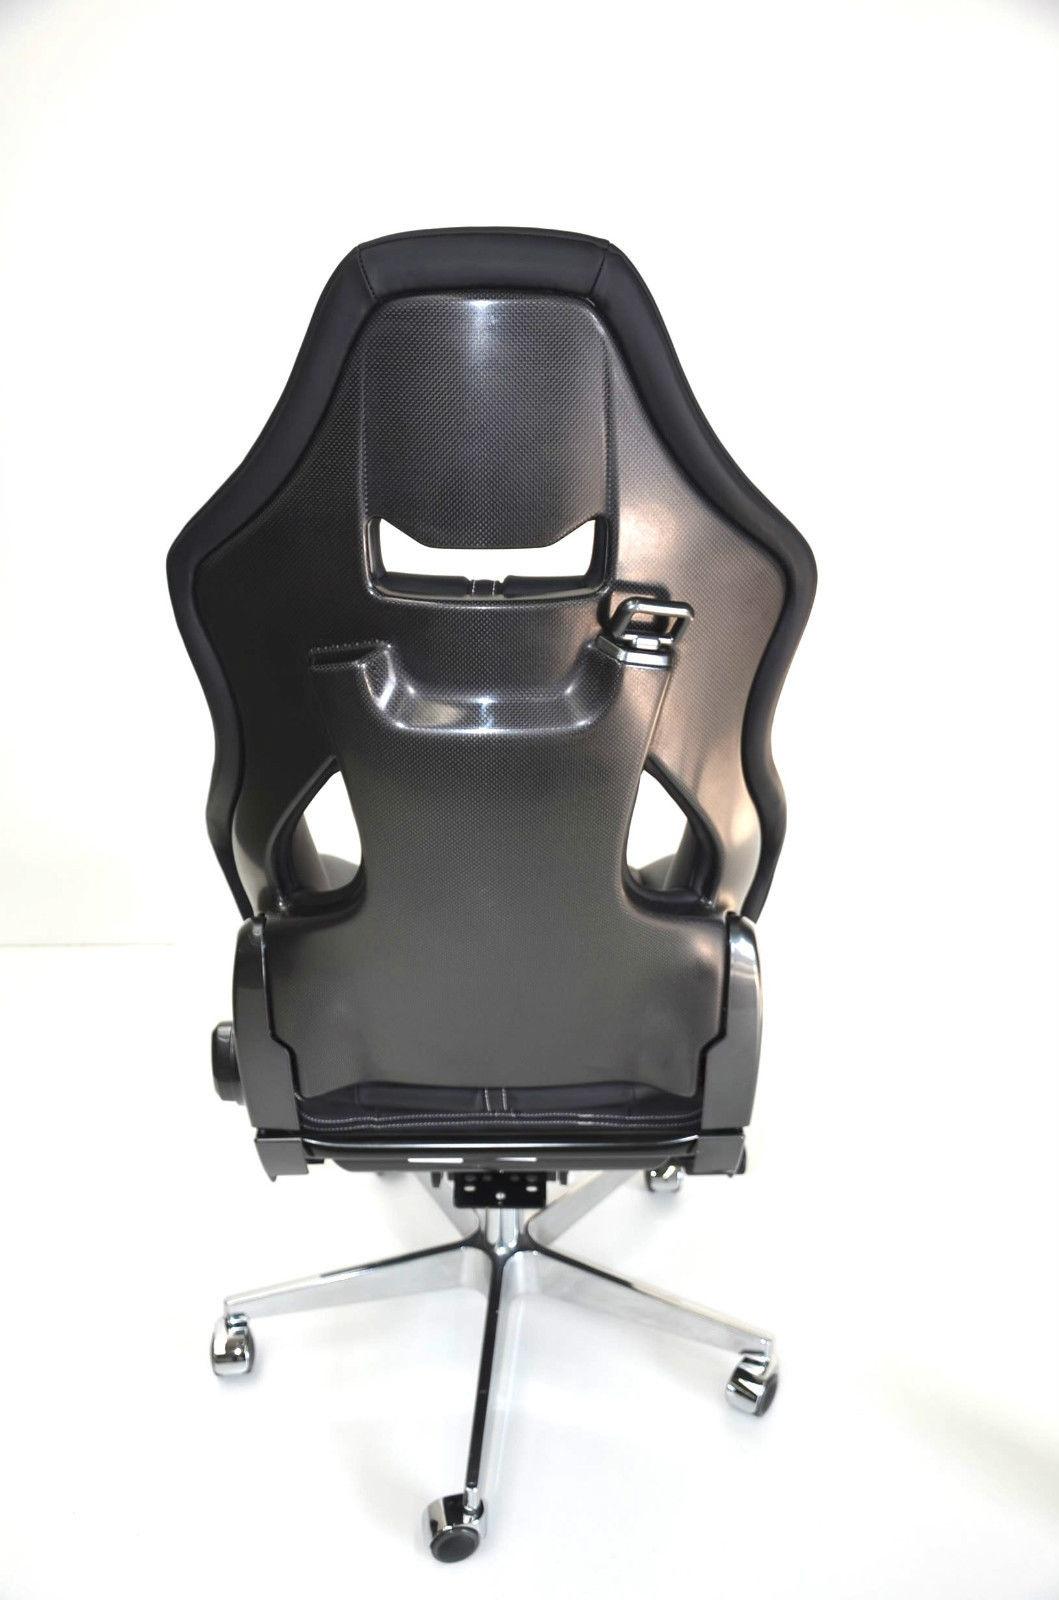 ferrari office chair uk ergonomic south africa 458 desk car atd sportscars ebay